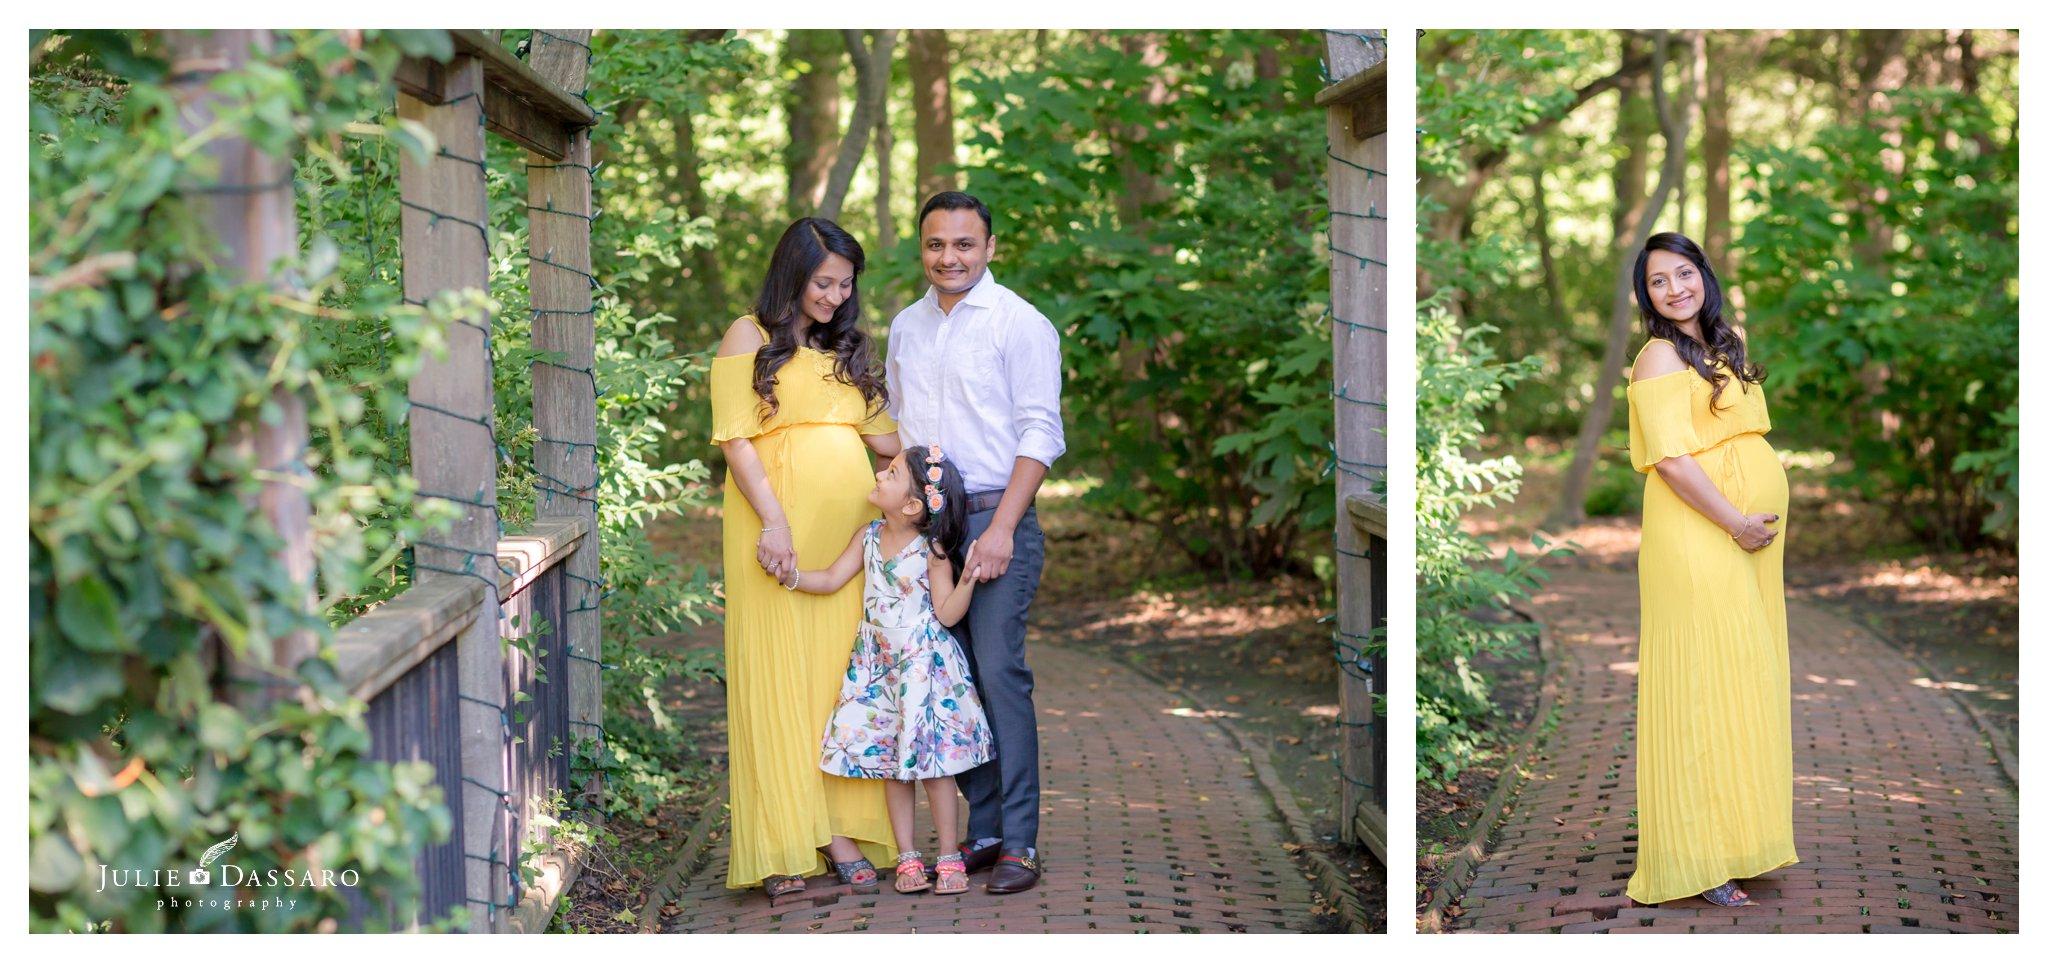 family photo under trellis